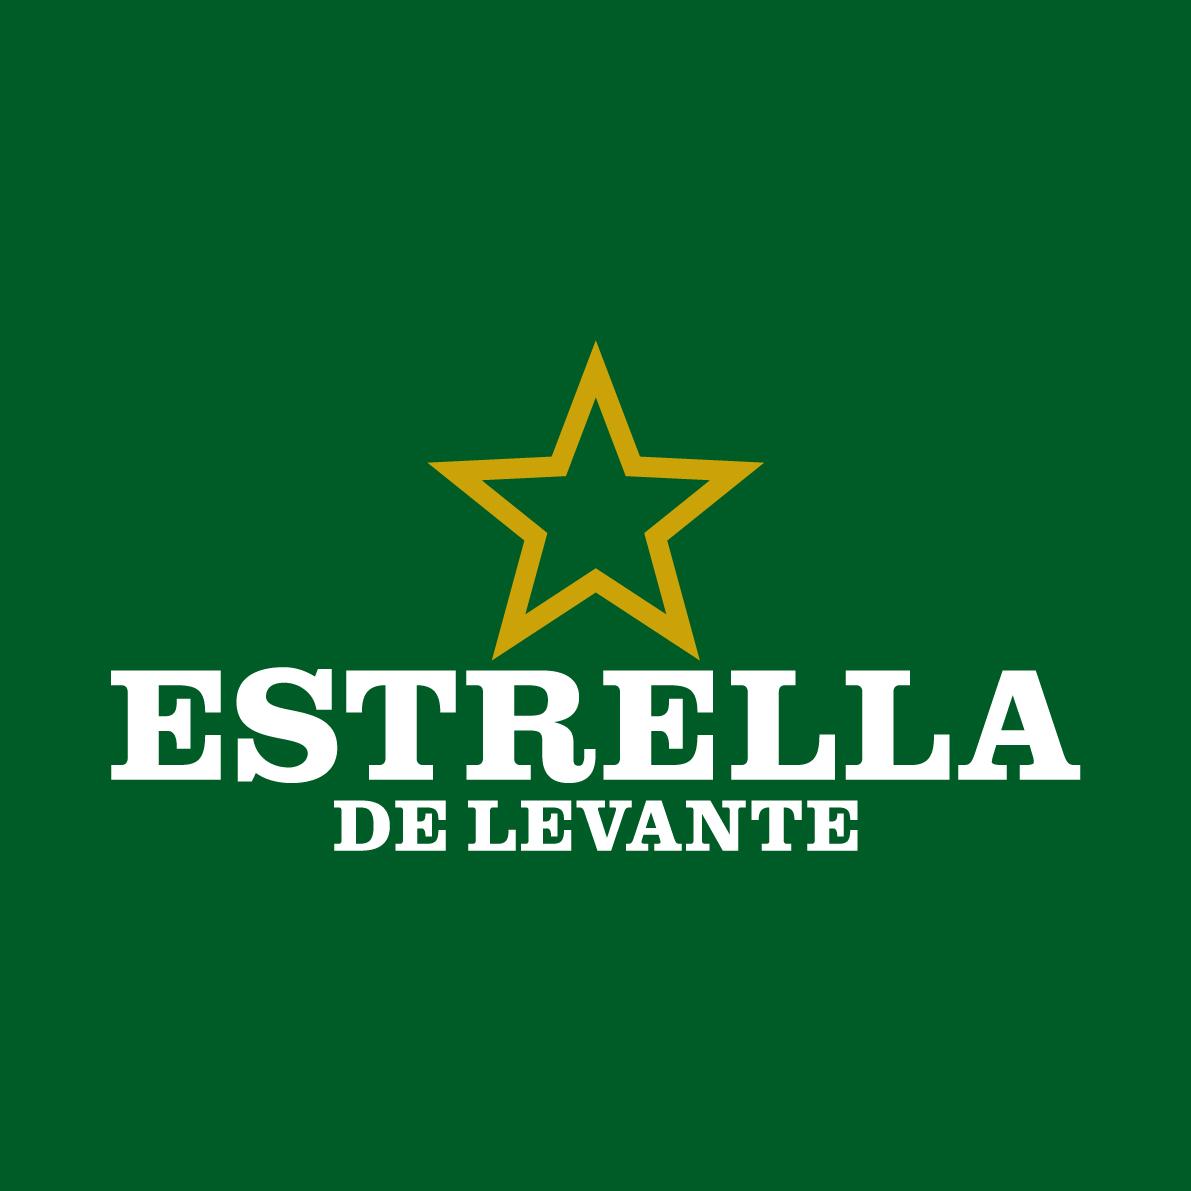 logo-estrella-verde-2012